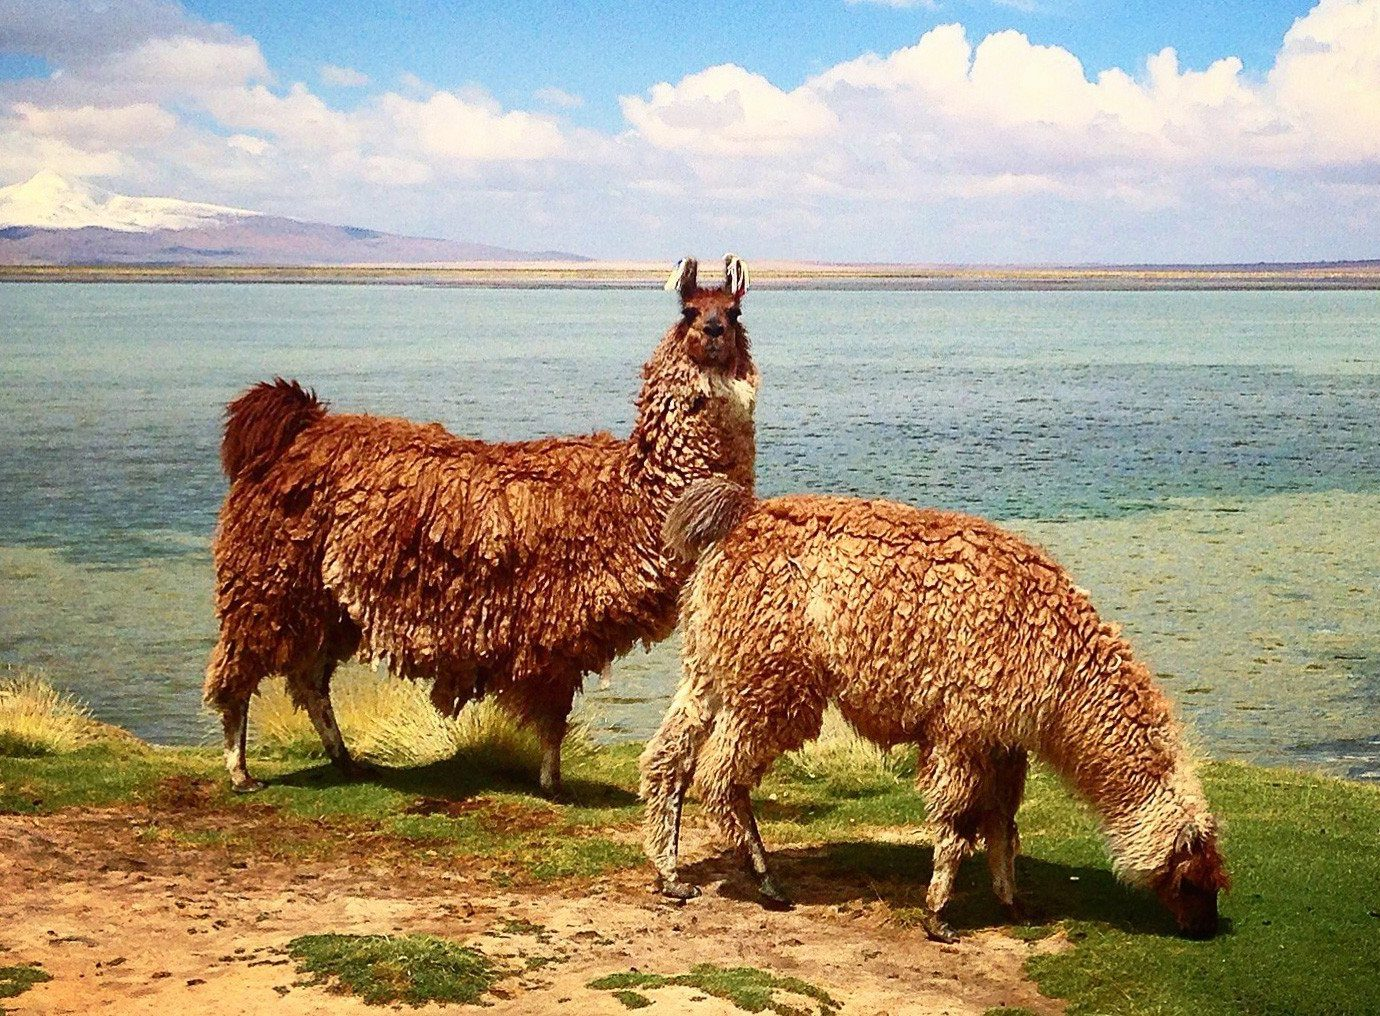 Outdoors + Adventure sky water outdoor grass mammal animal vertebrate camel like mammal fauna pasture llama brown alpaca grassland grazing prairie